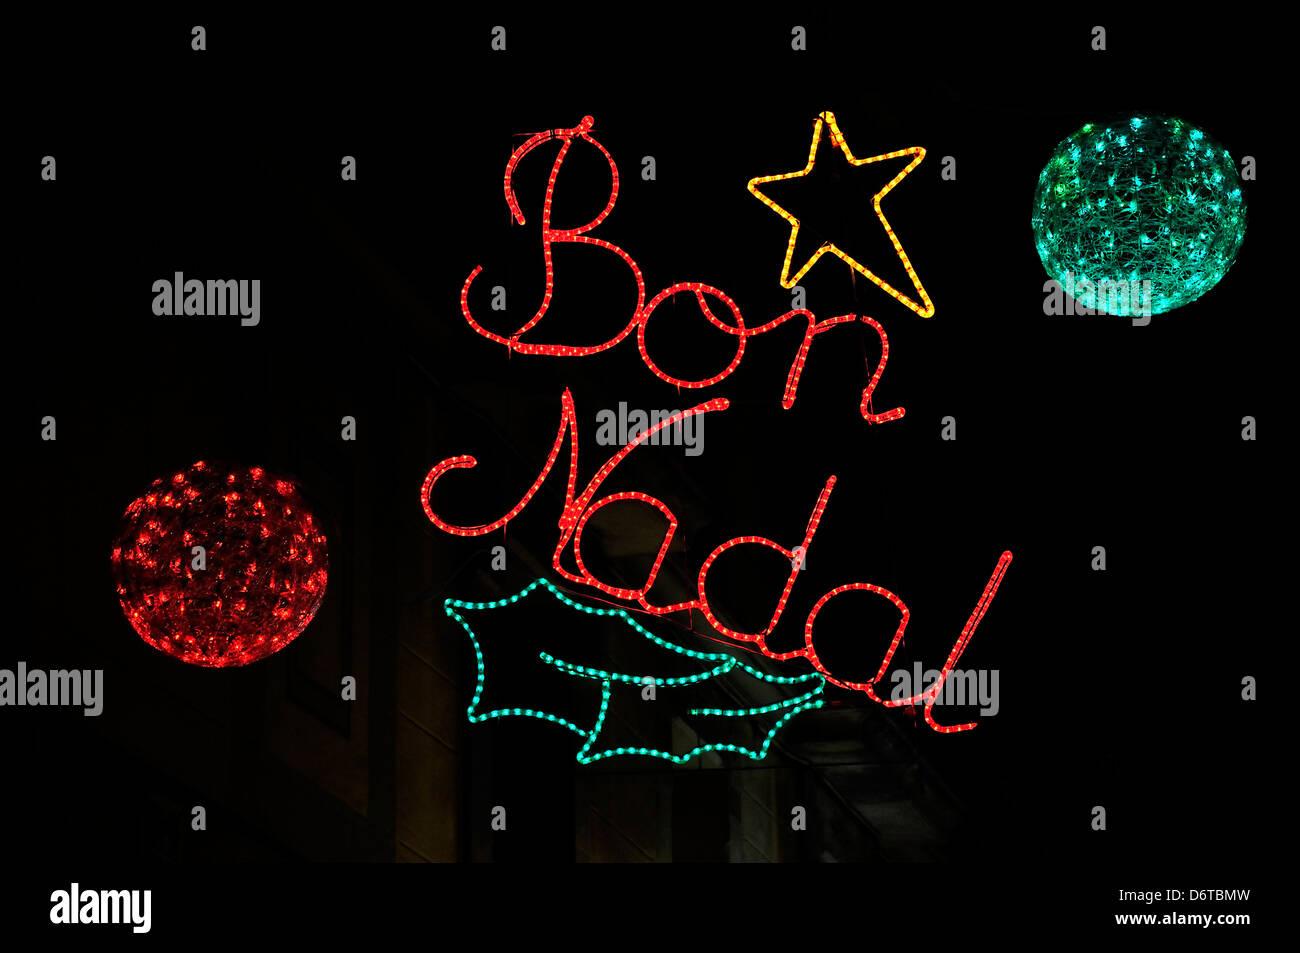 Bon Nadal Imgenes De Stock  Bon Nadal Fotos De Stock  Alamy